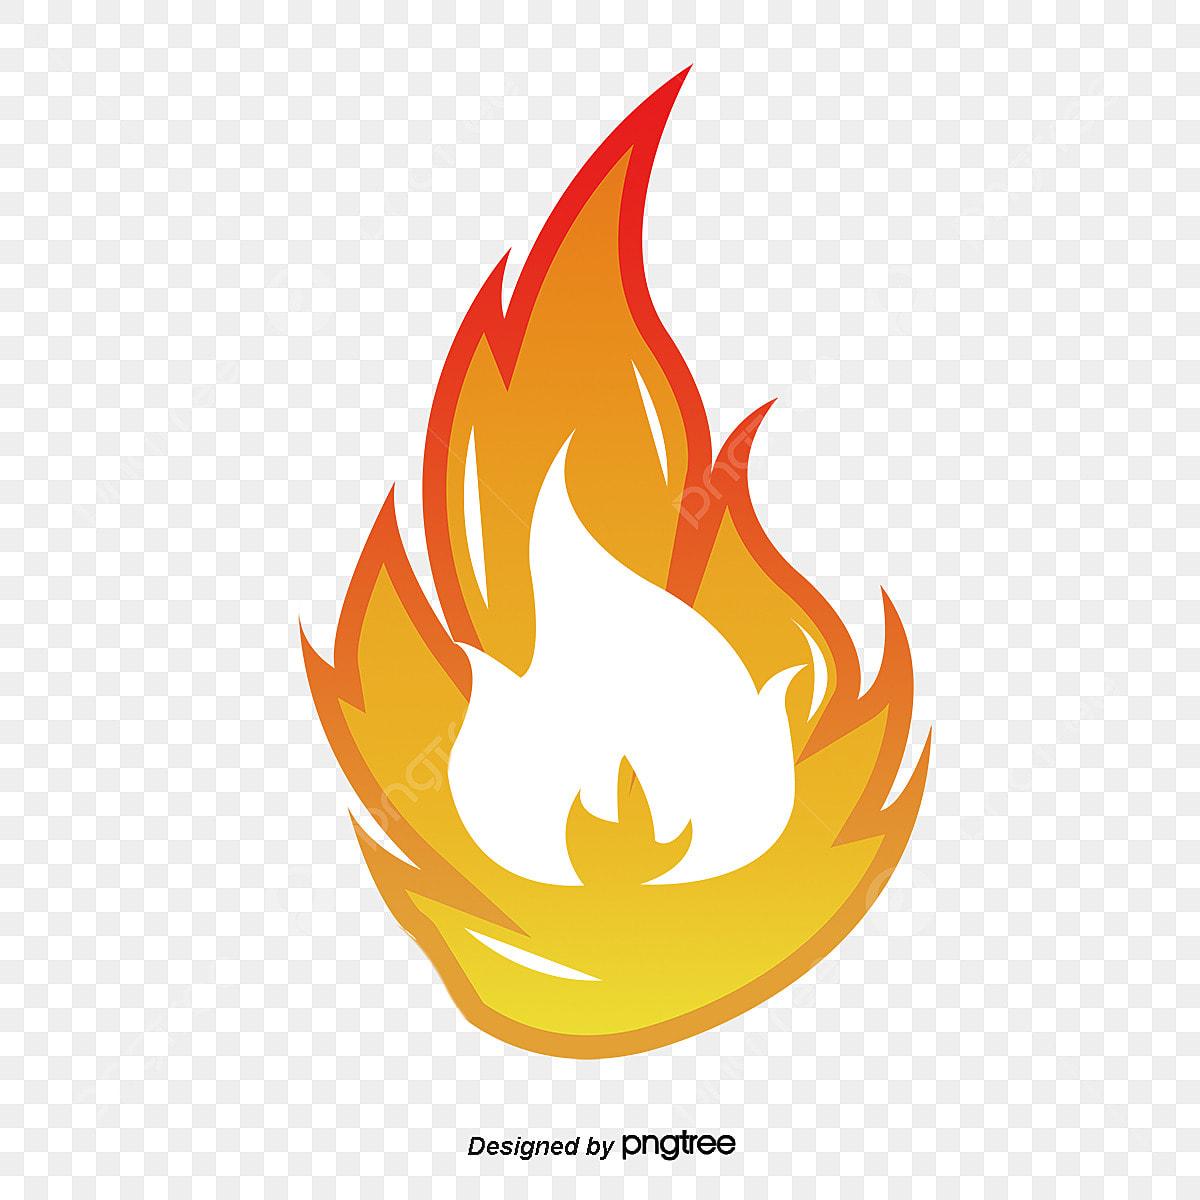 La Flamme De Dessins Animes Feu Dessin Centro De Feu Fichier